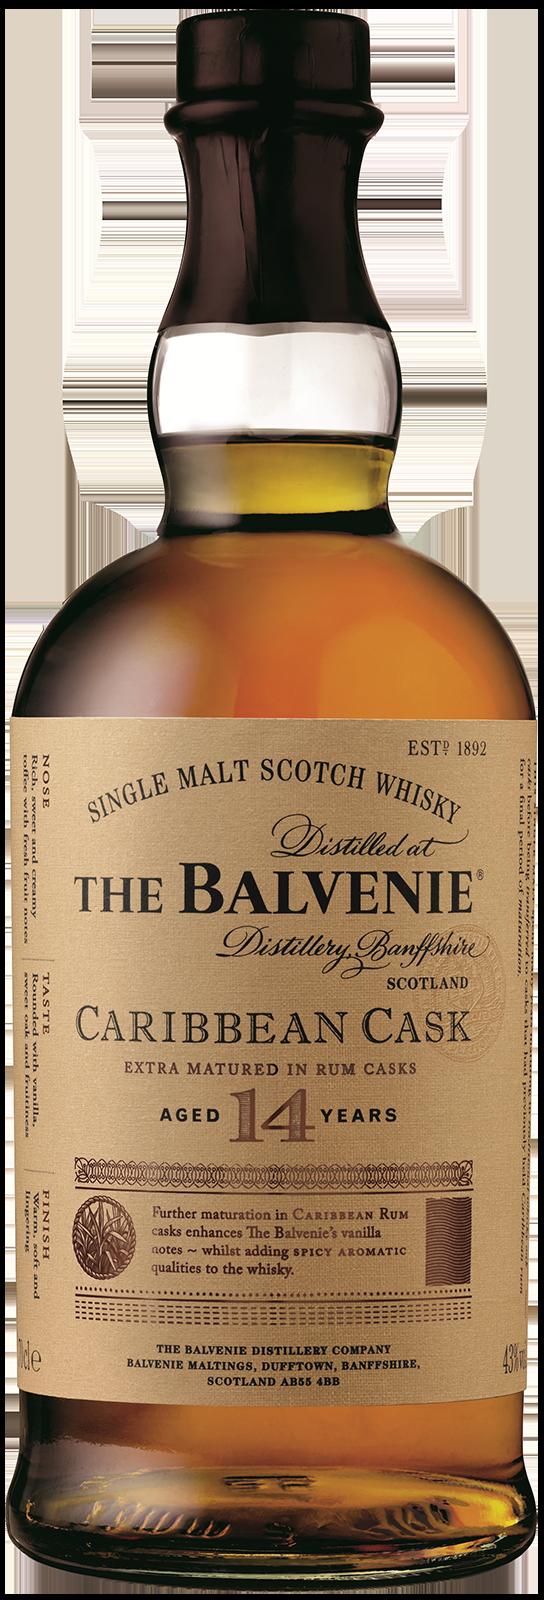 NV-Balvenie Whisky 14 Years Caribbean Cask